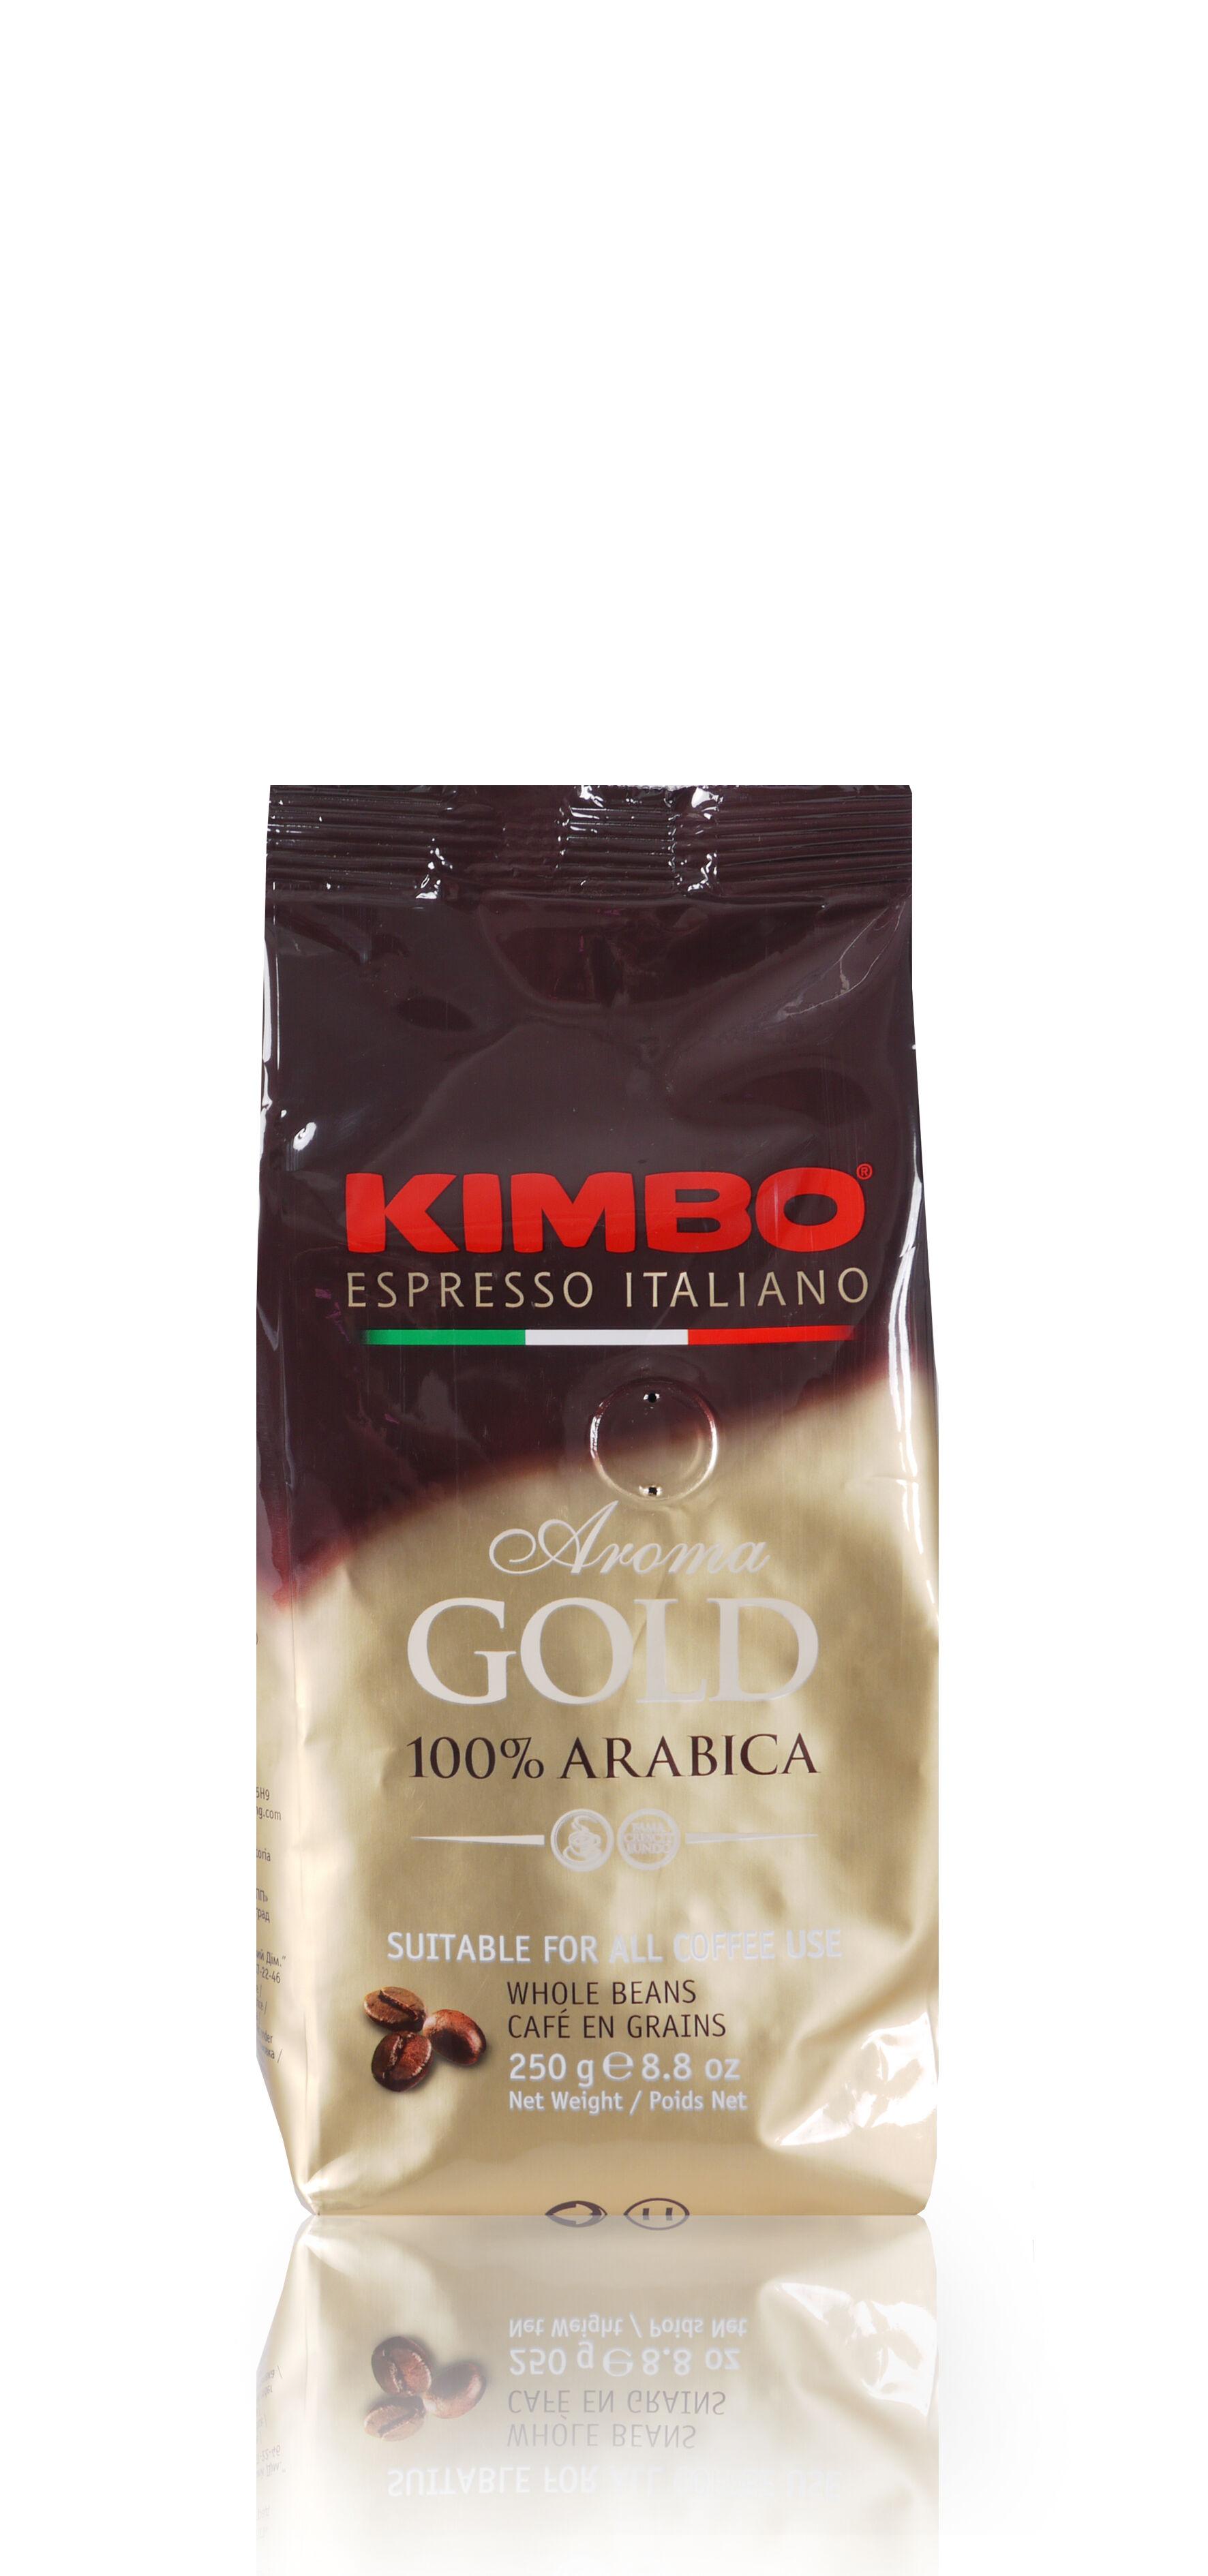 KIMBO Aroma Gold 100% Arabica 12x 250 g Bohnen im Beutel